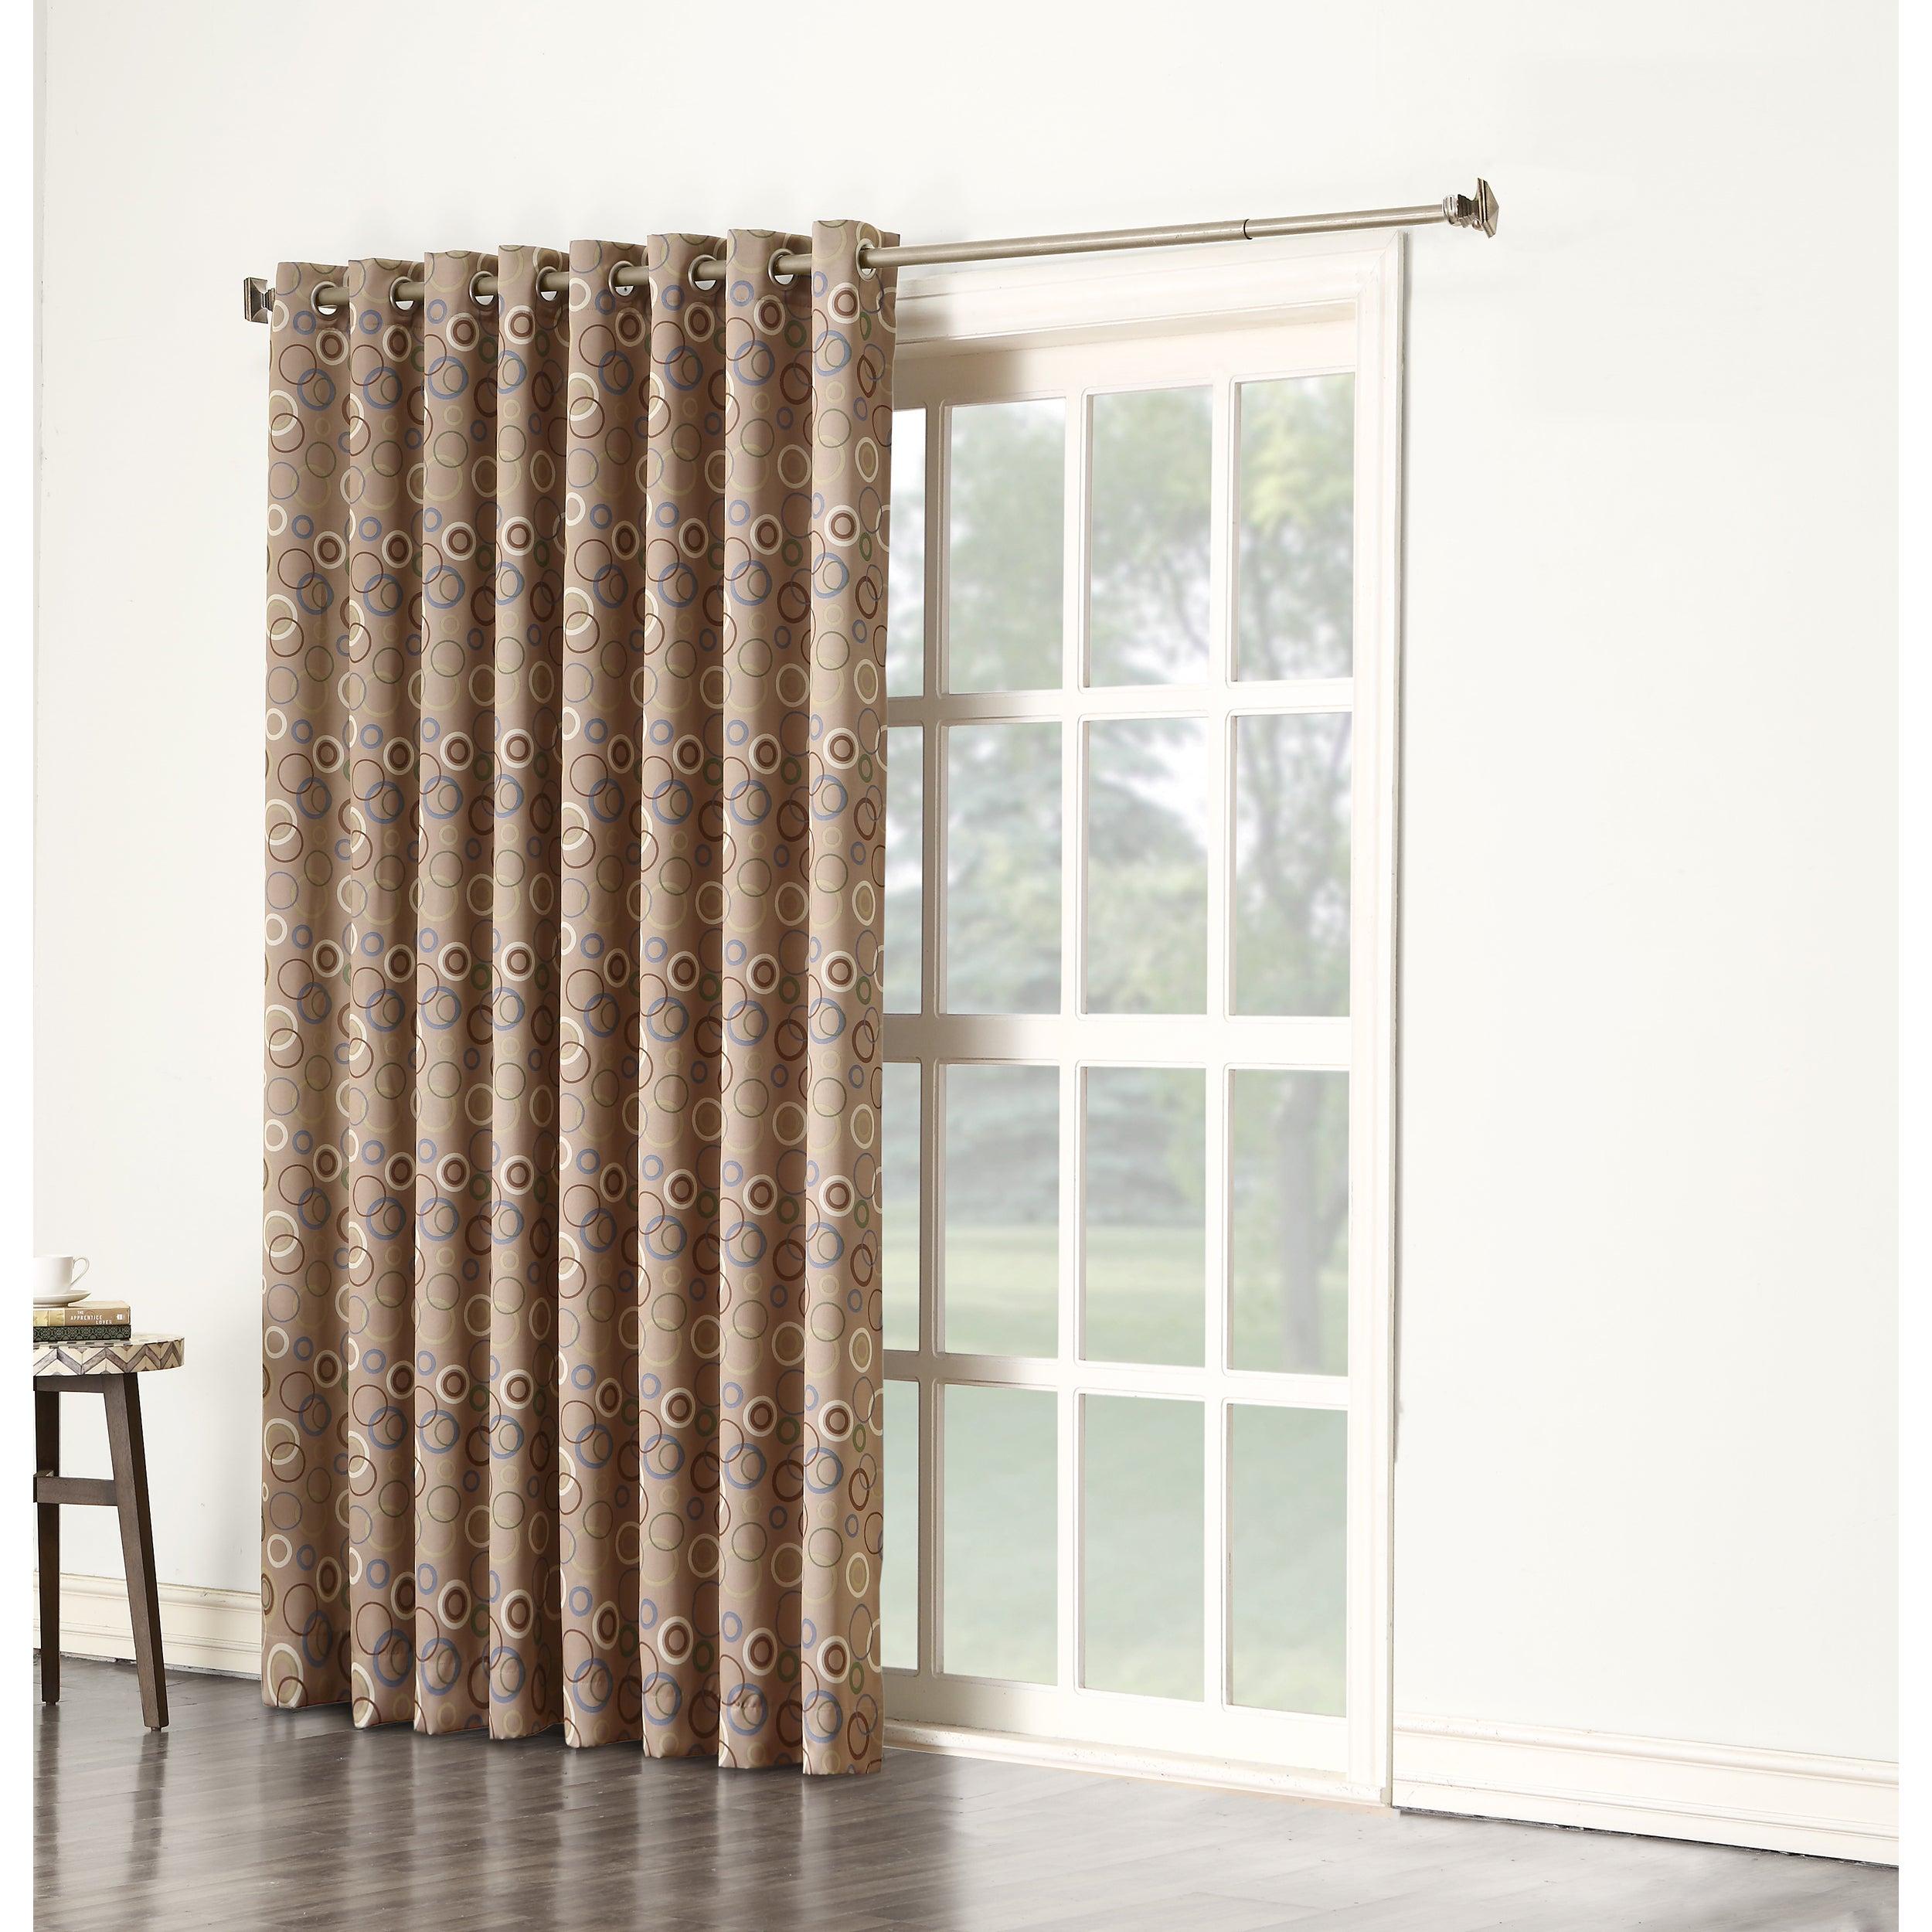 Sun Zero Gail Grommet Room Darkening Window Patio Curtain...